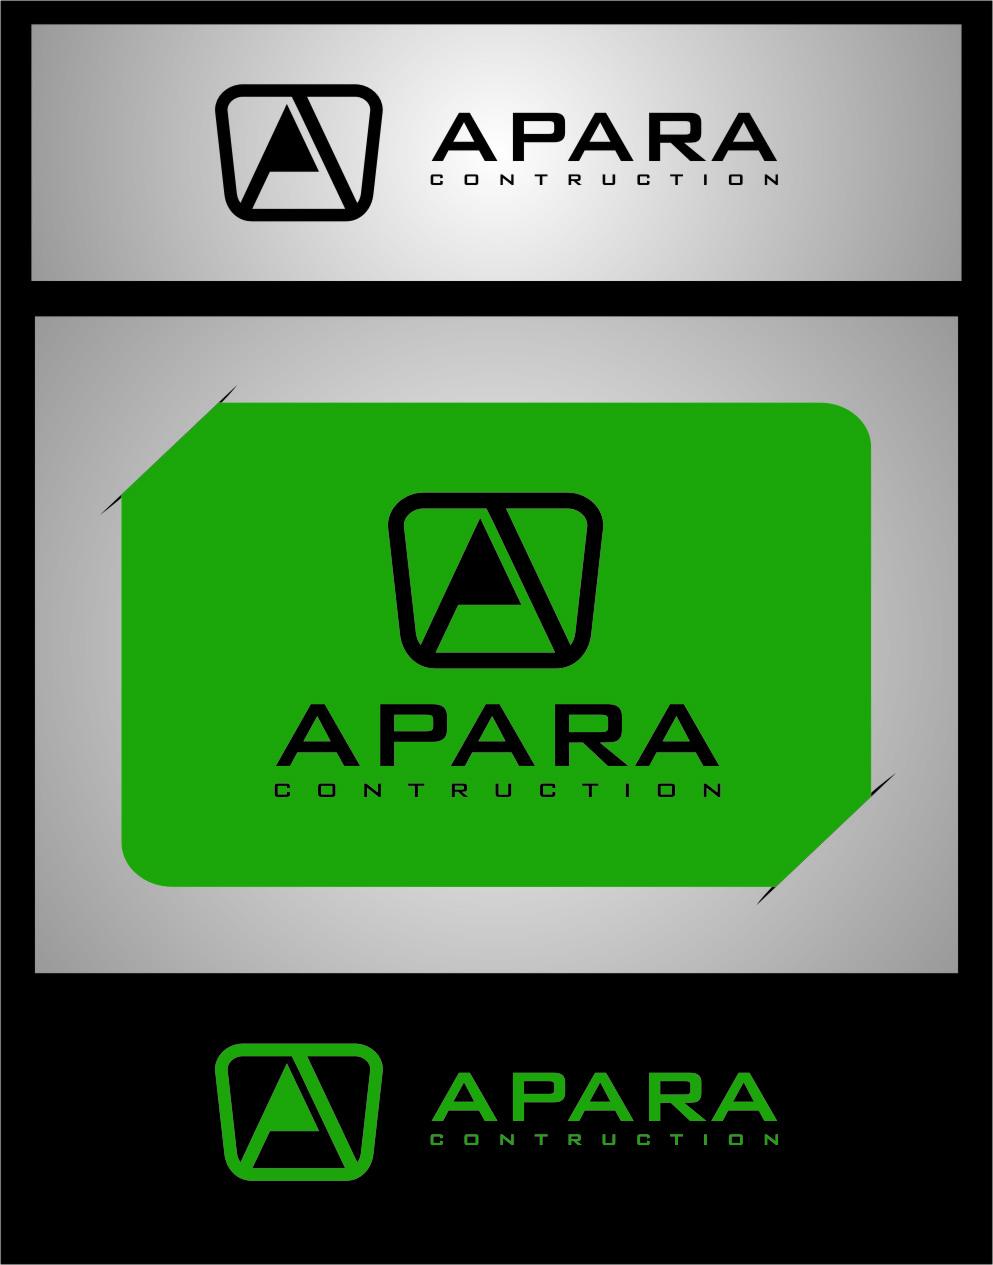 Logo Design by Ngepet_art - Entry No. 183 in the Logo Design Contest Apara Construction Logo Design.